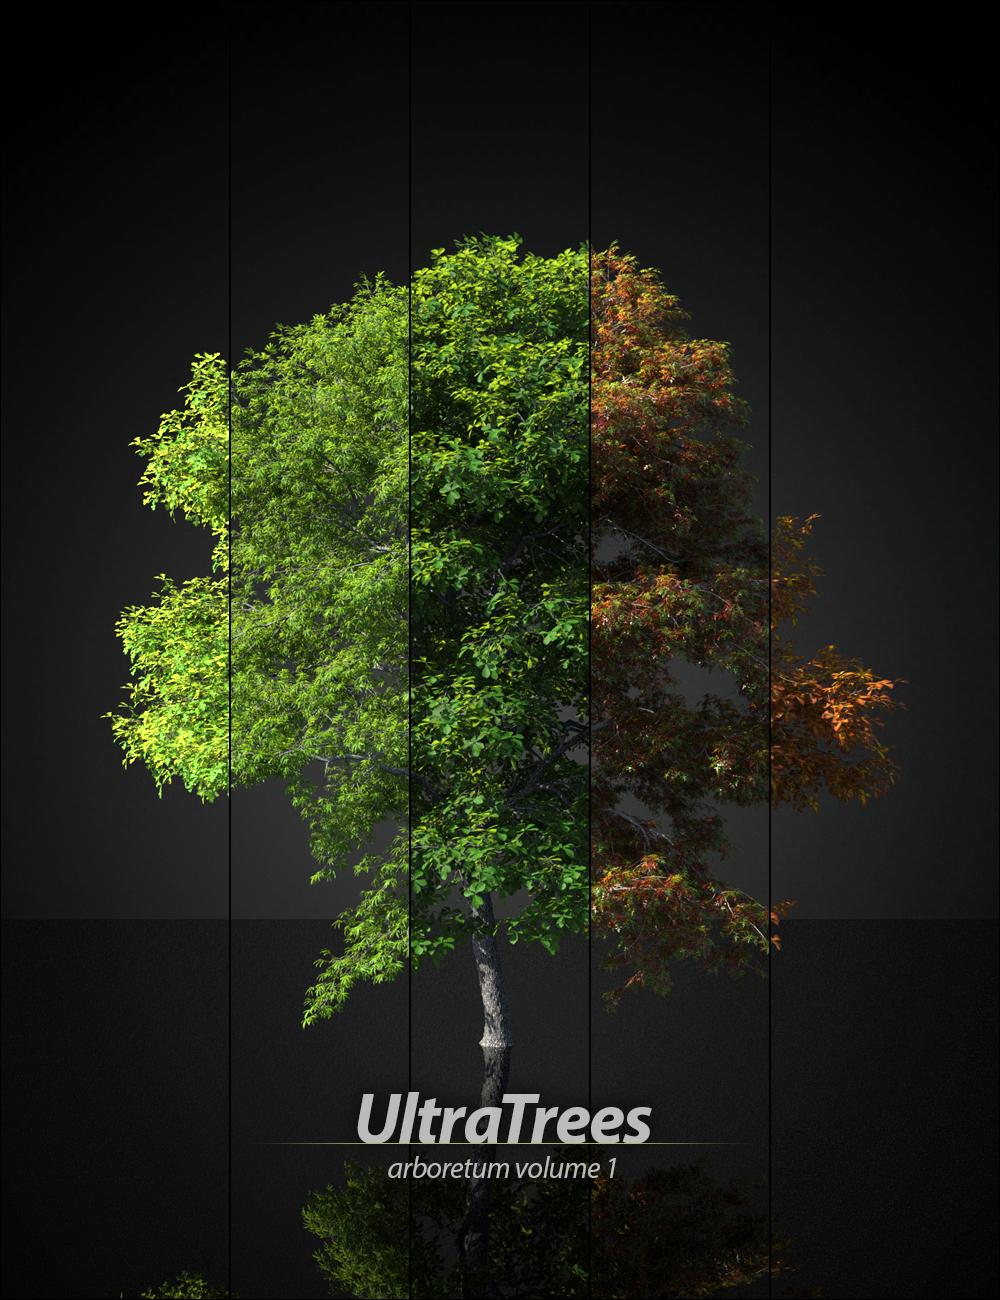 UltraTrees - Arboretum Volume 1 by: HowieFarkes, 3D Models by Daz 3D